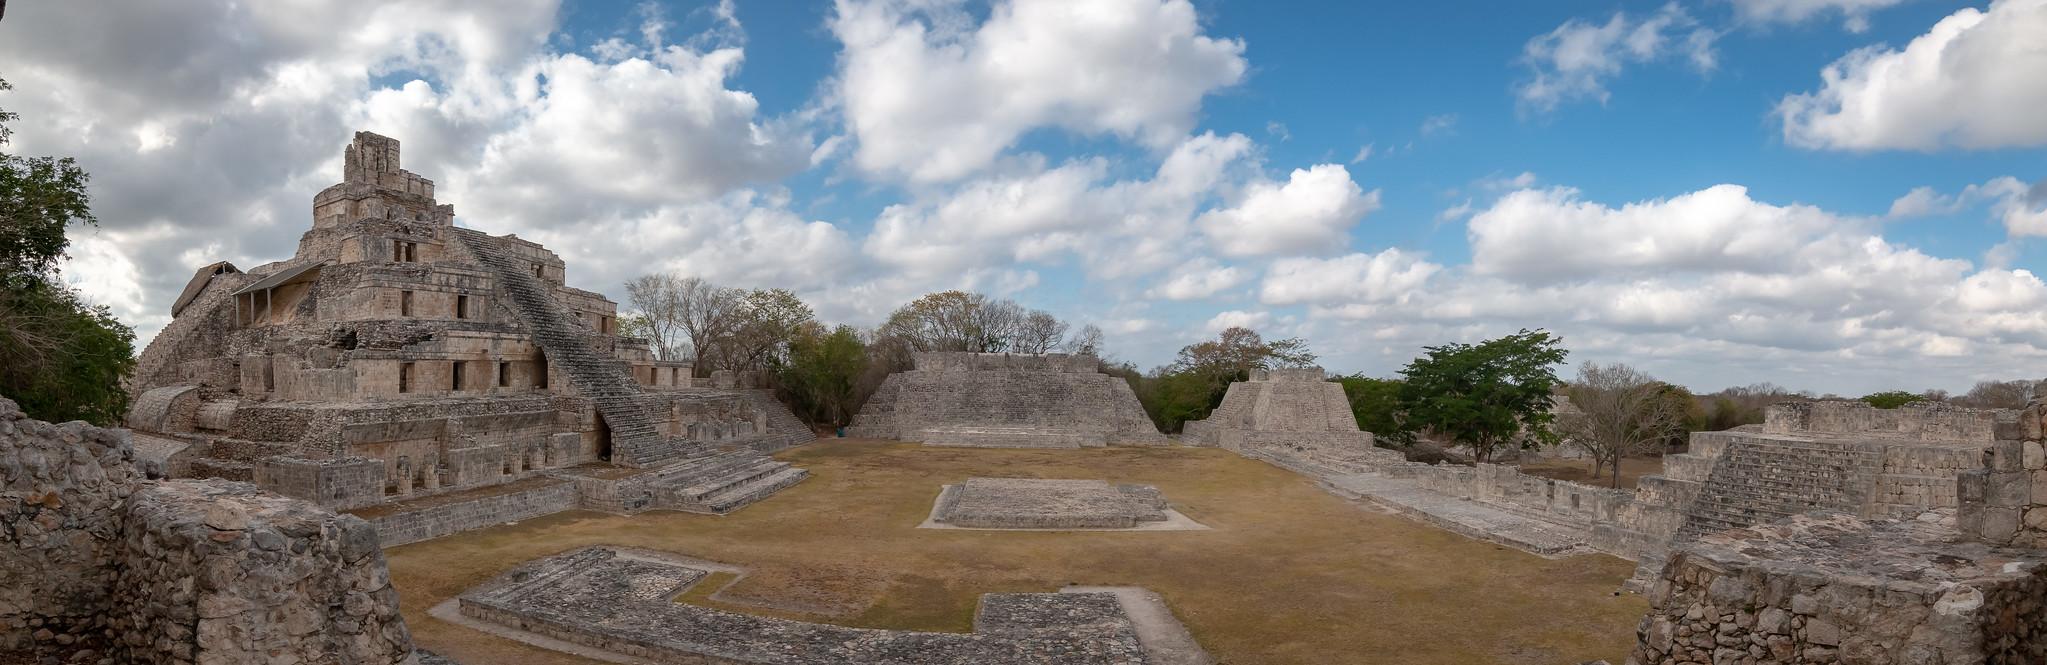 Edzna- Campeche - [Mexique]